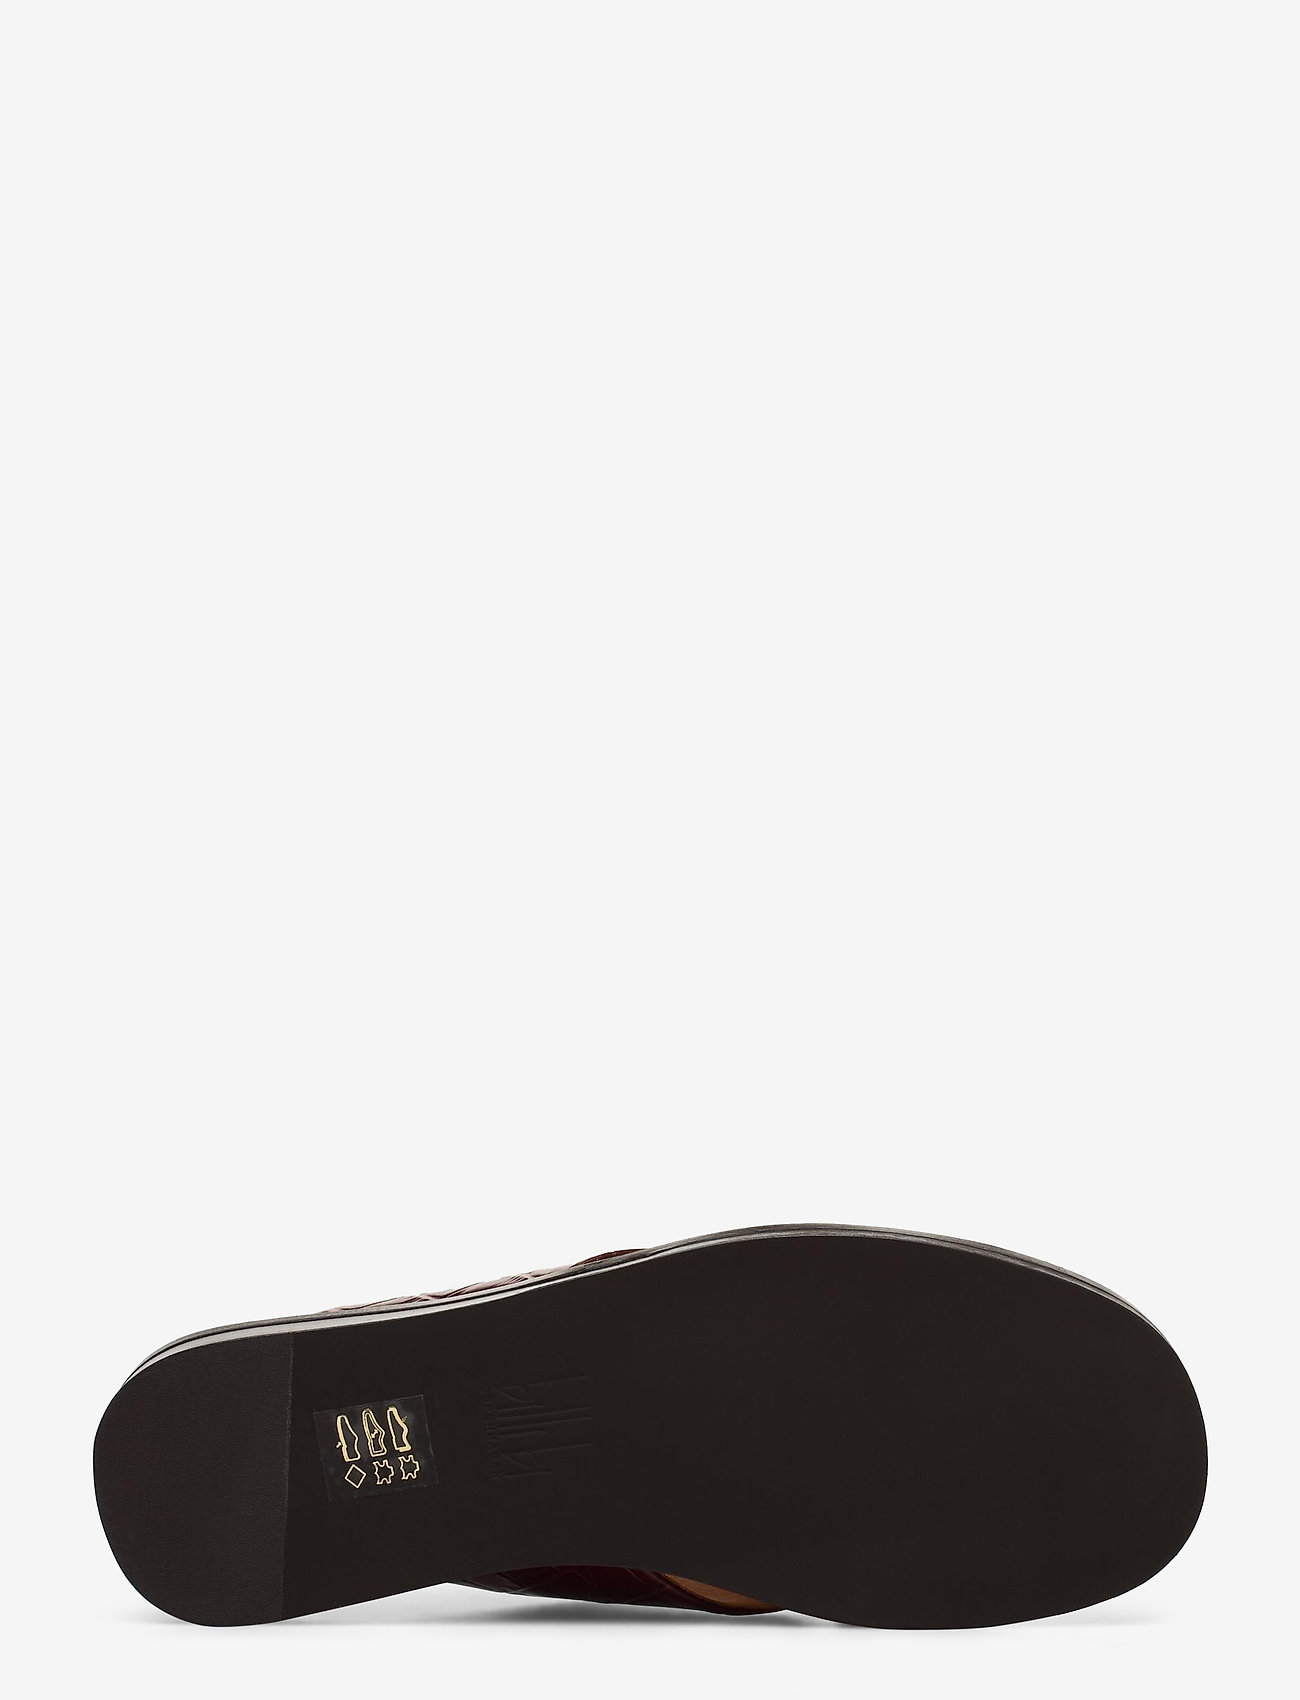 Sandals 4172 (Brandy Monterey 25) (90.35 €) - Billi Bi yQsnj